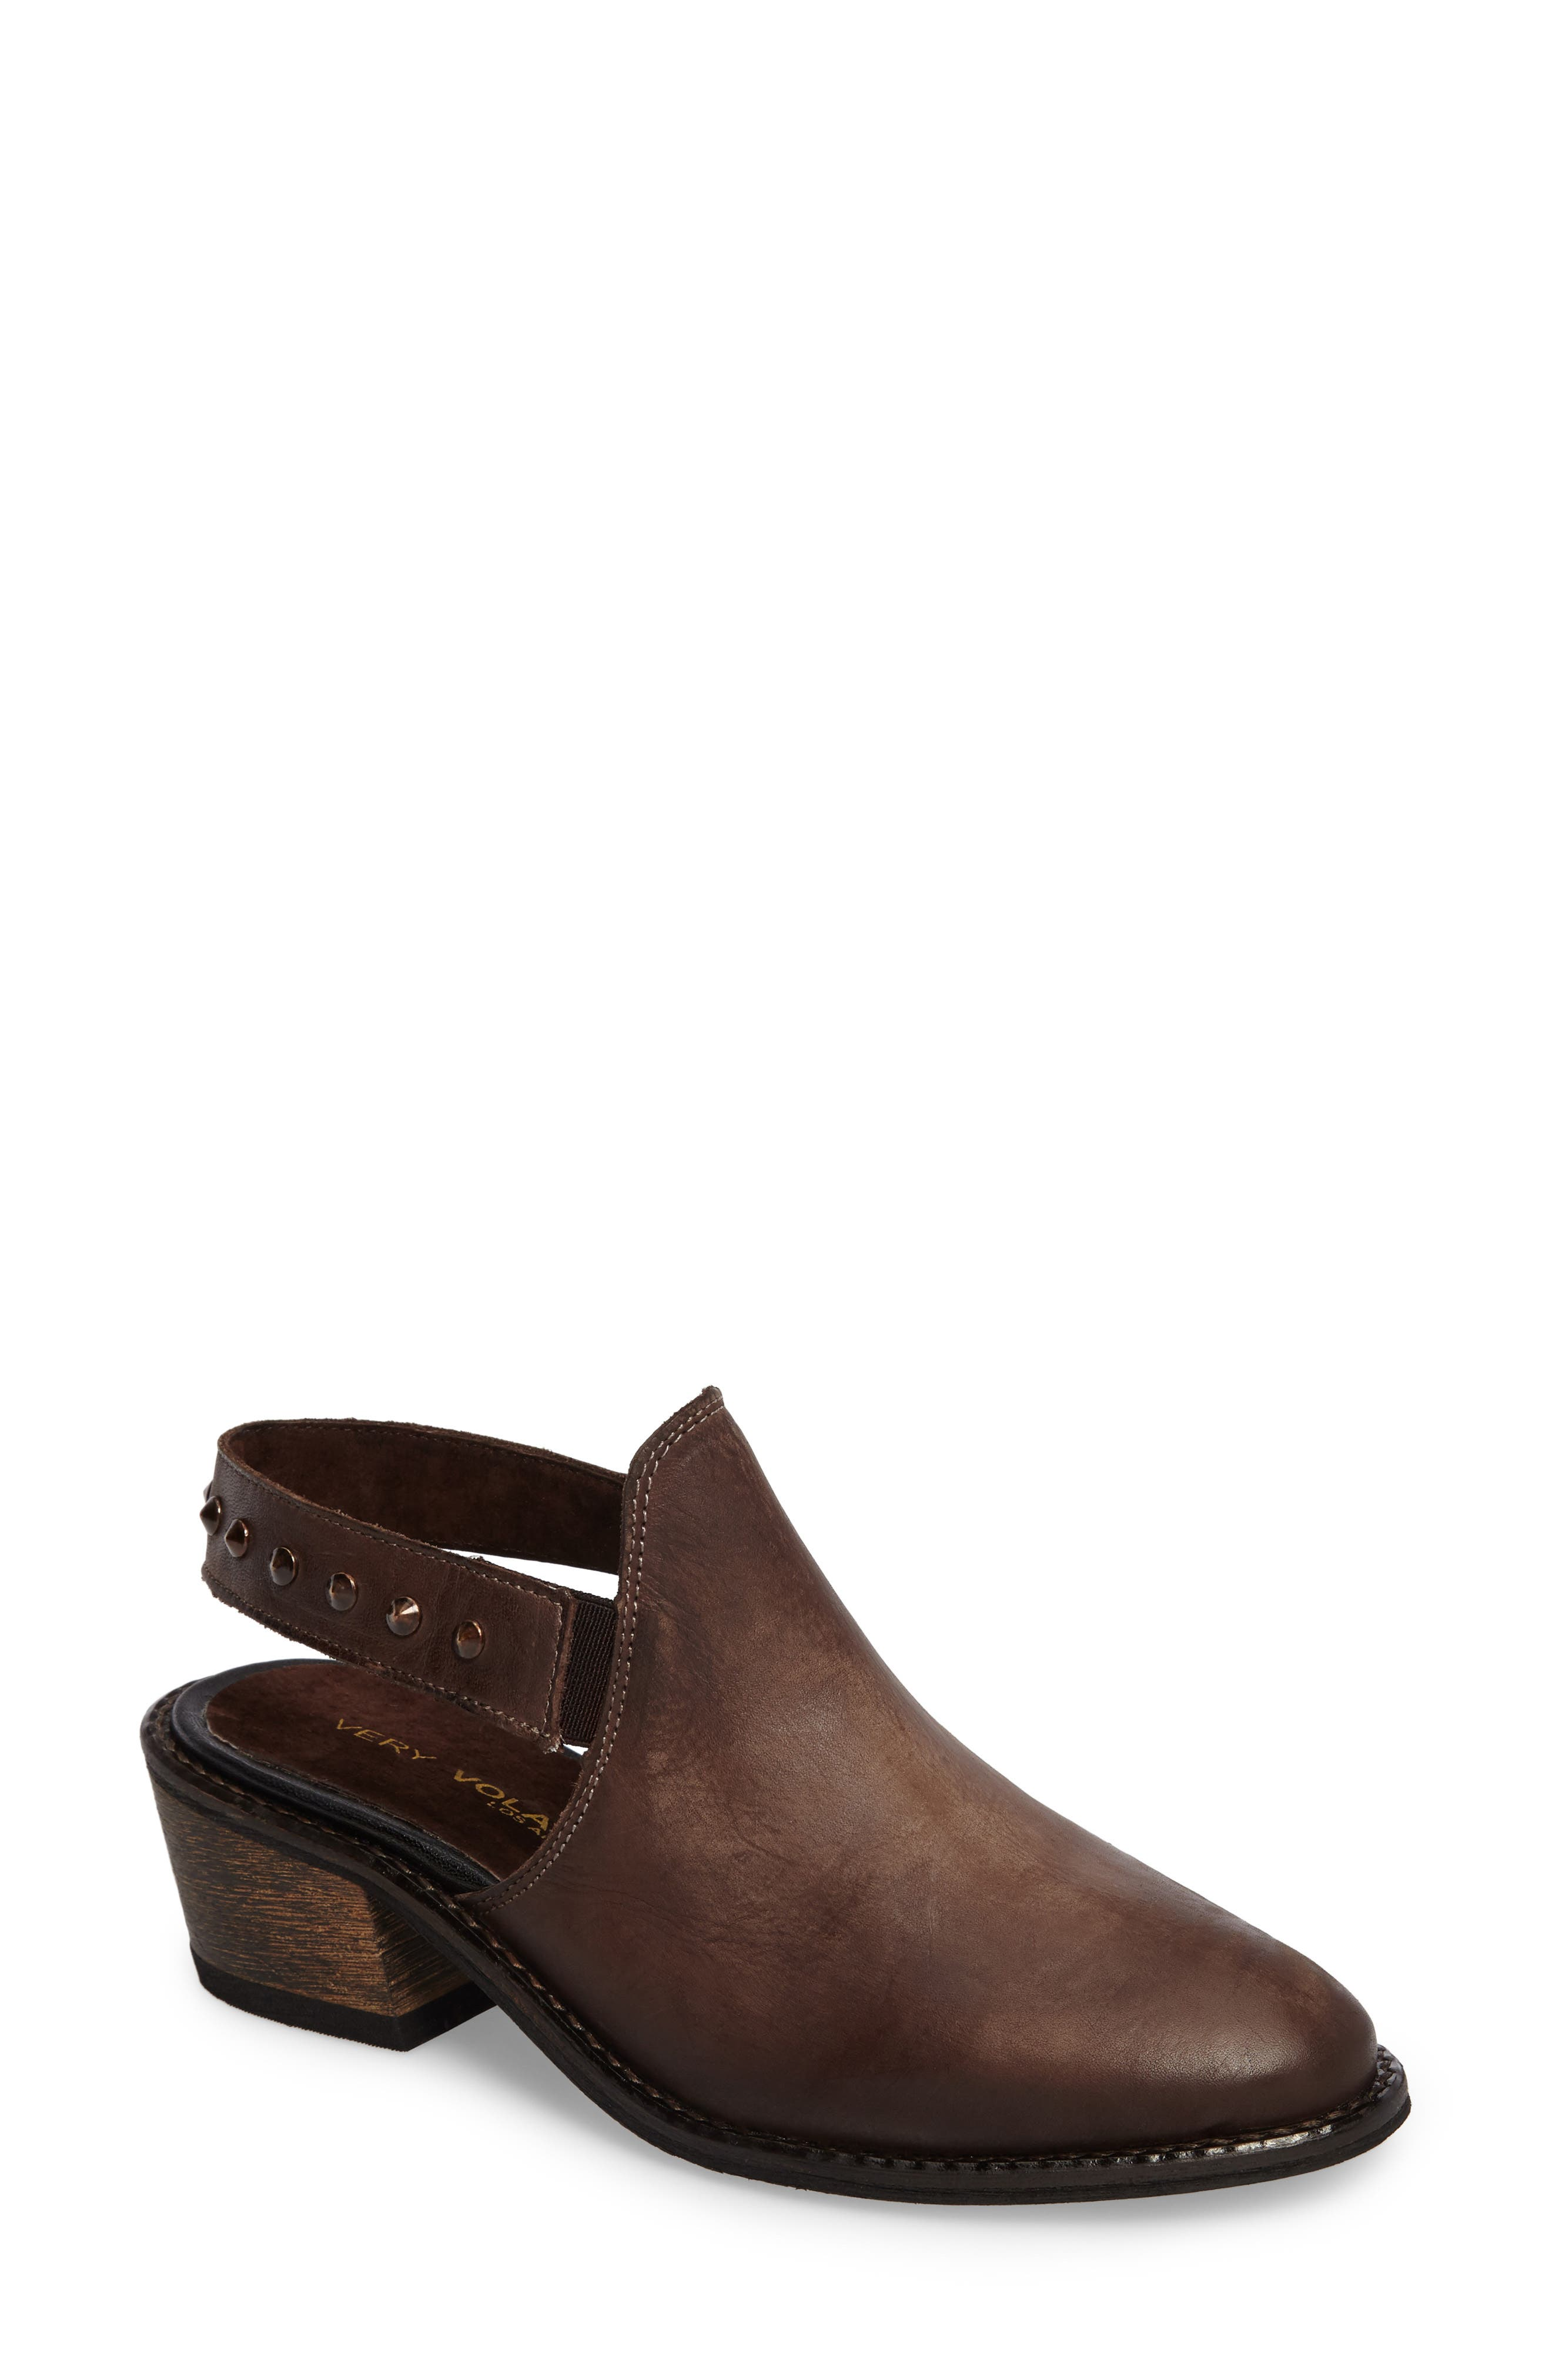 Adamo Studded Slingback Mule,                         Main,                         color,